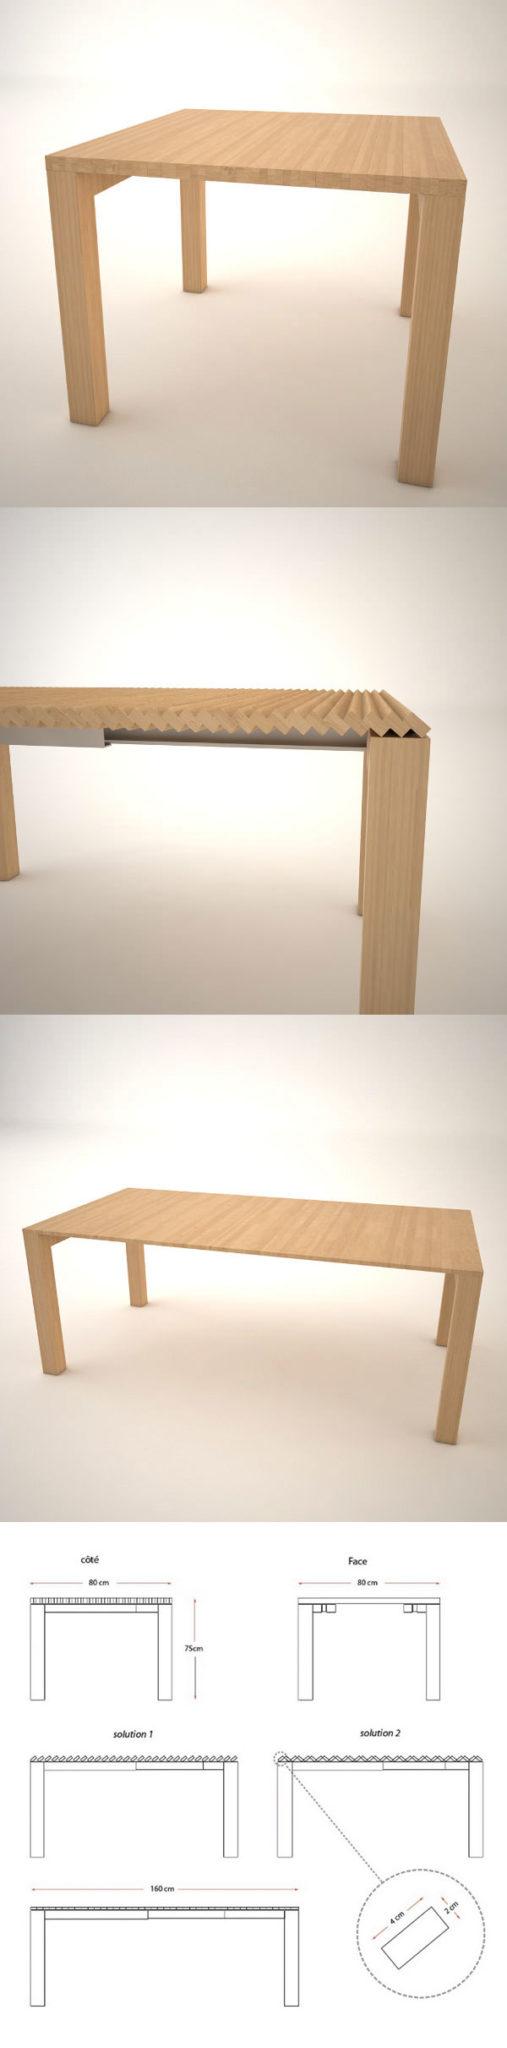 طاولات سفرة